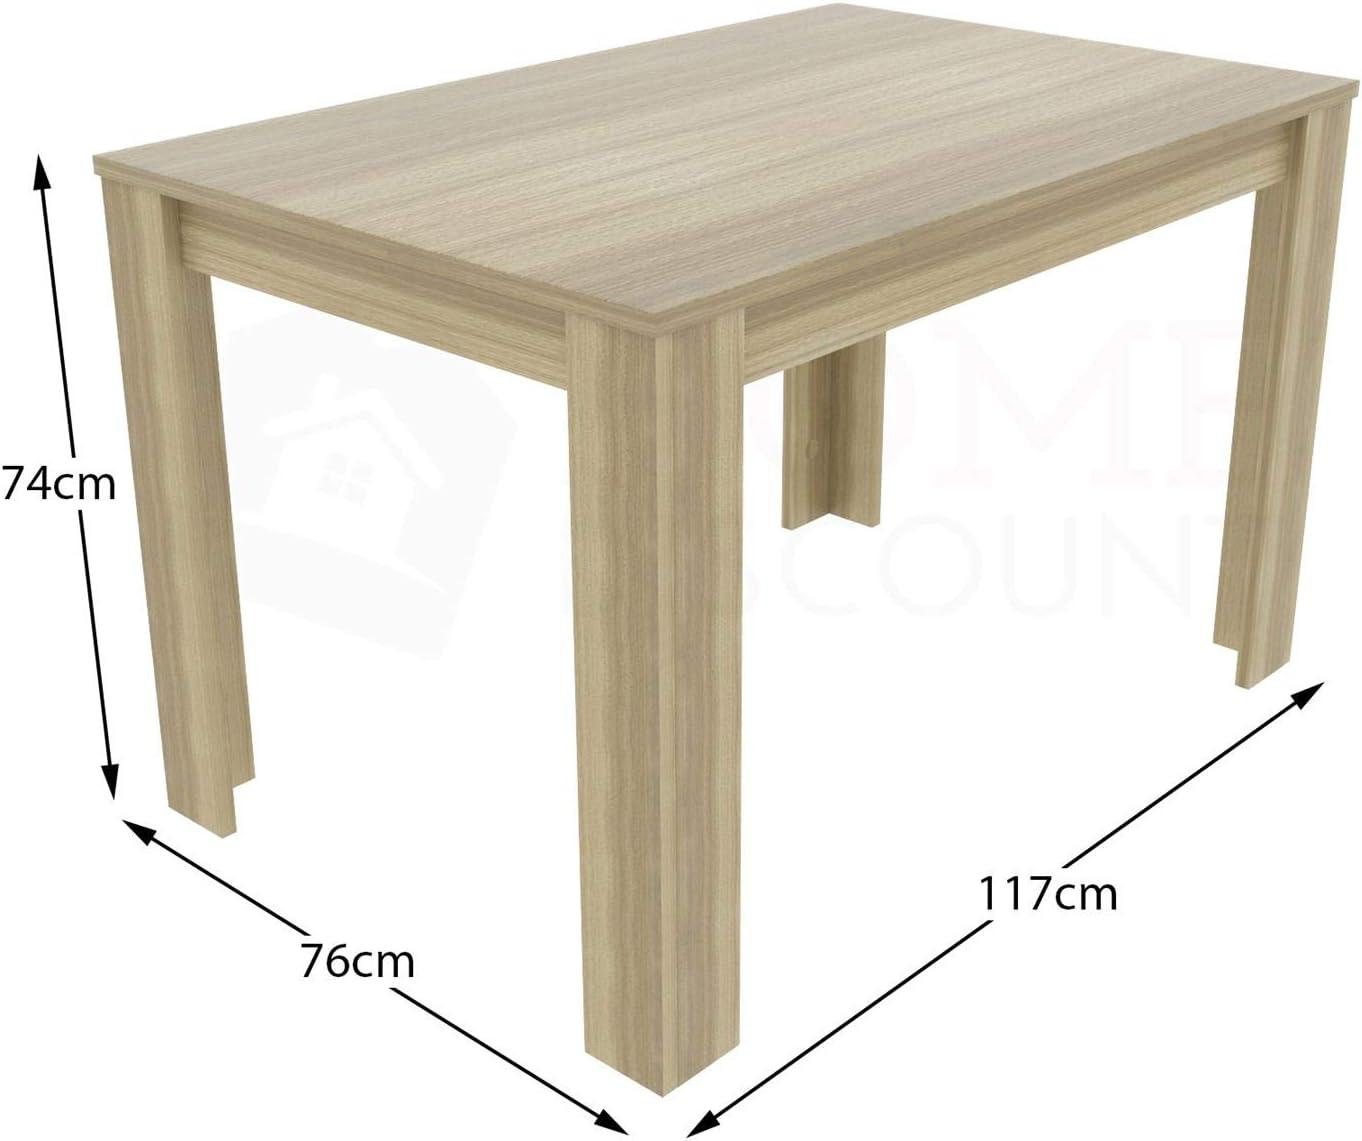 Vida Designs Medina 4 Seater Dining Table Oak Canterbury 4 Pu Faux Leather Black Oak Dining Chairs Modern Kitchen Dining Room Furniture Set